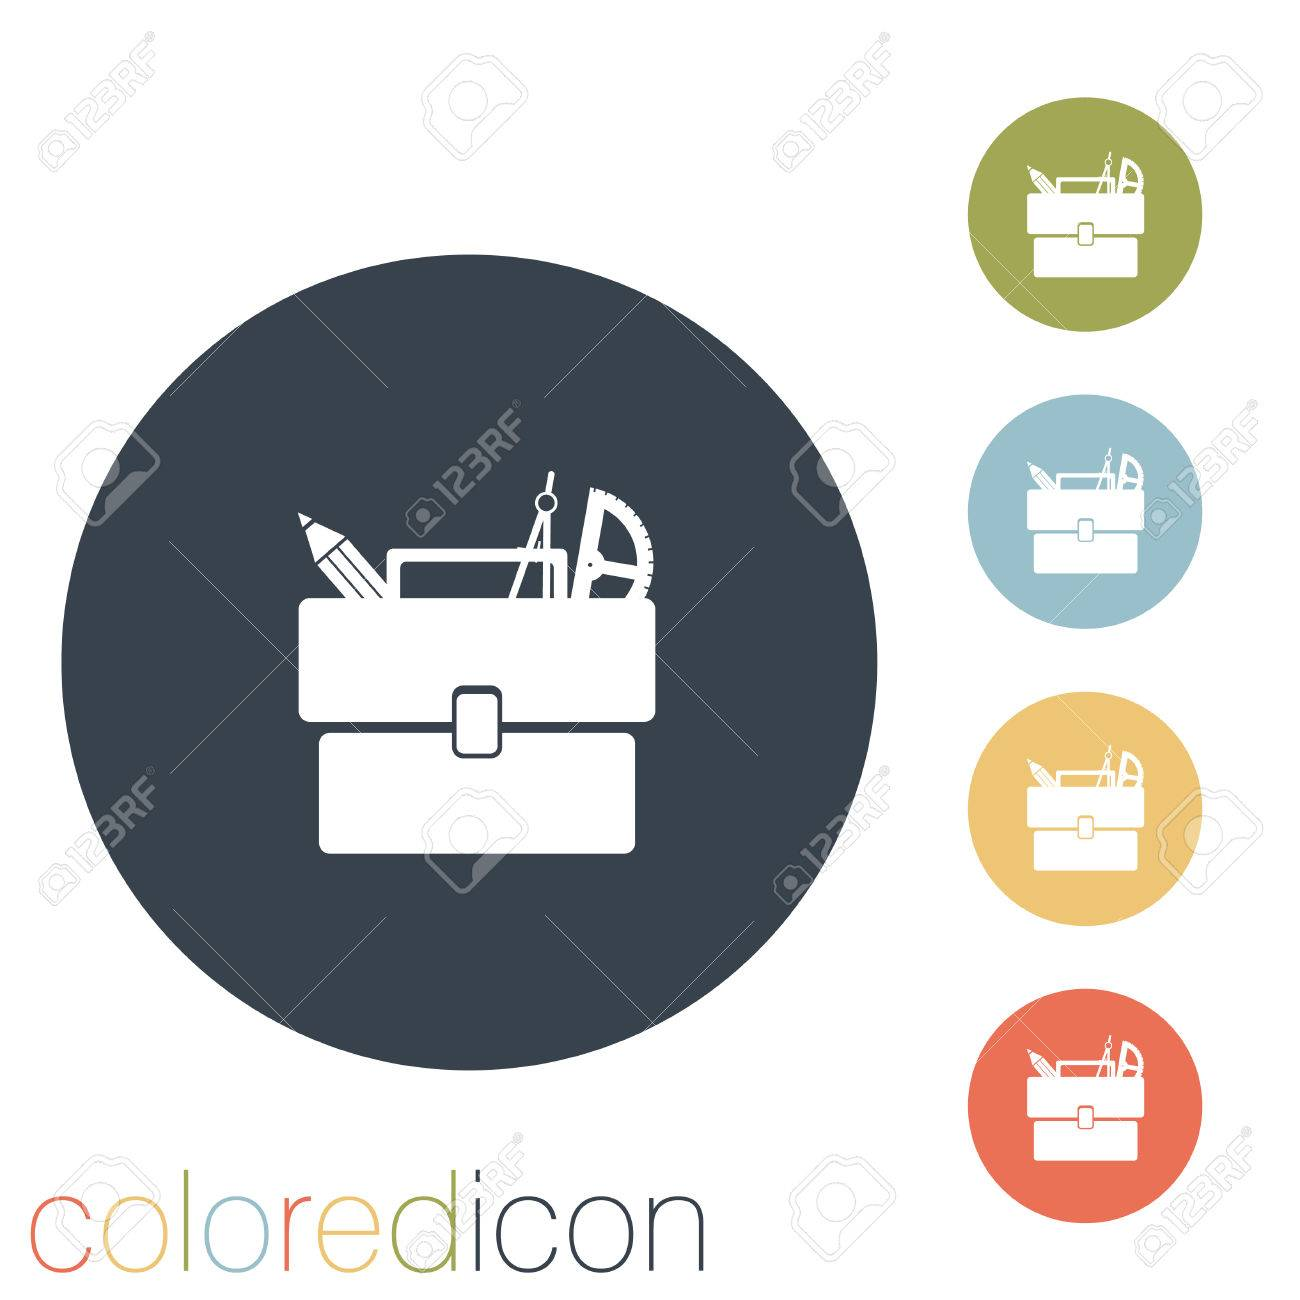 School bag diagram - School Bag With Stationery Symbol Office Or School Stock Vector 32589289